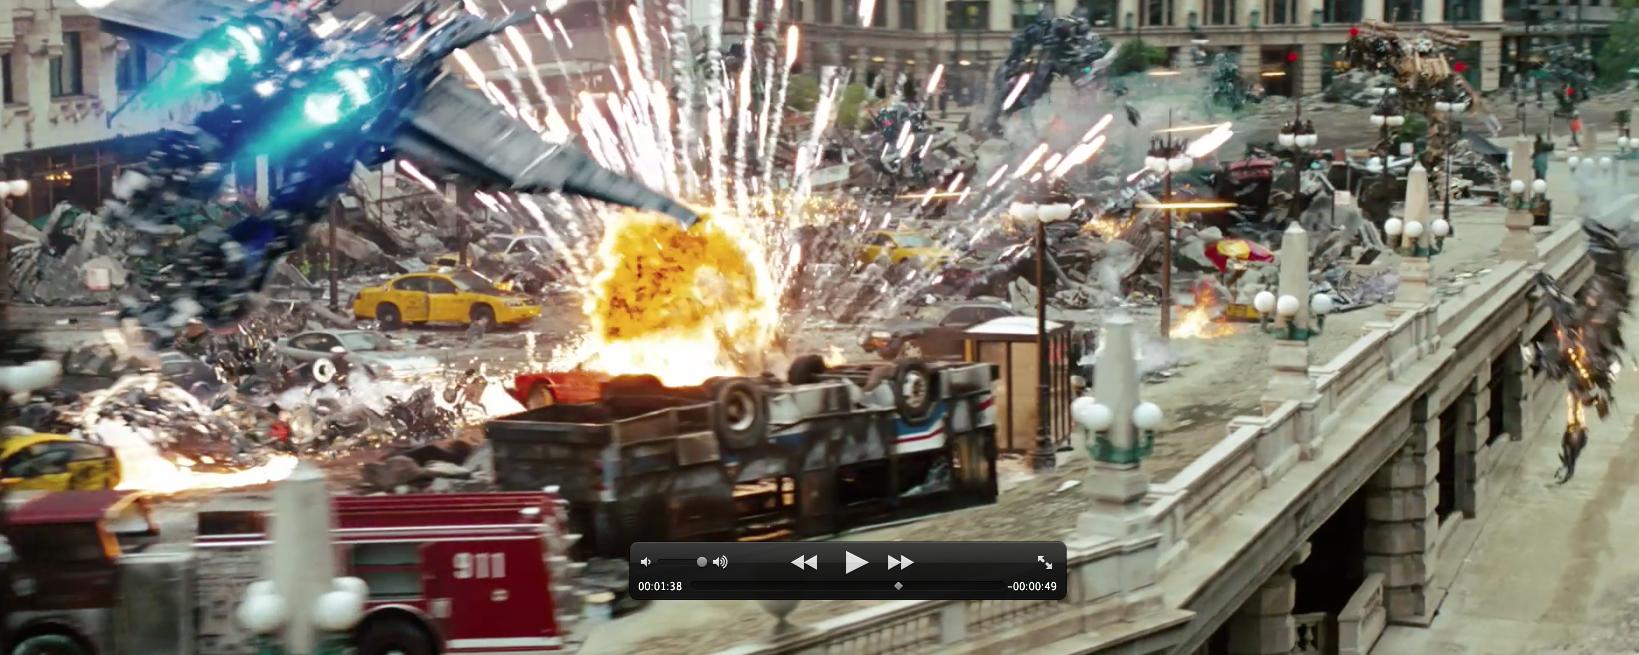 Transformers 3 jetwing Optimus Prime kicks ass Decepticons